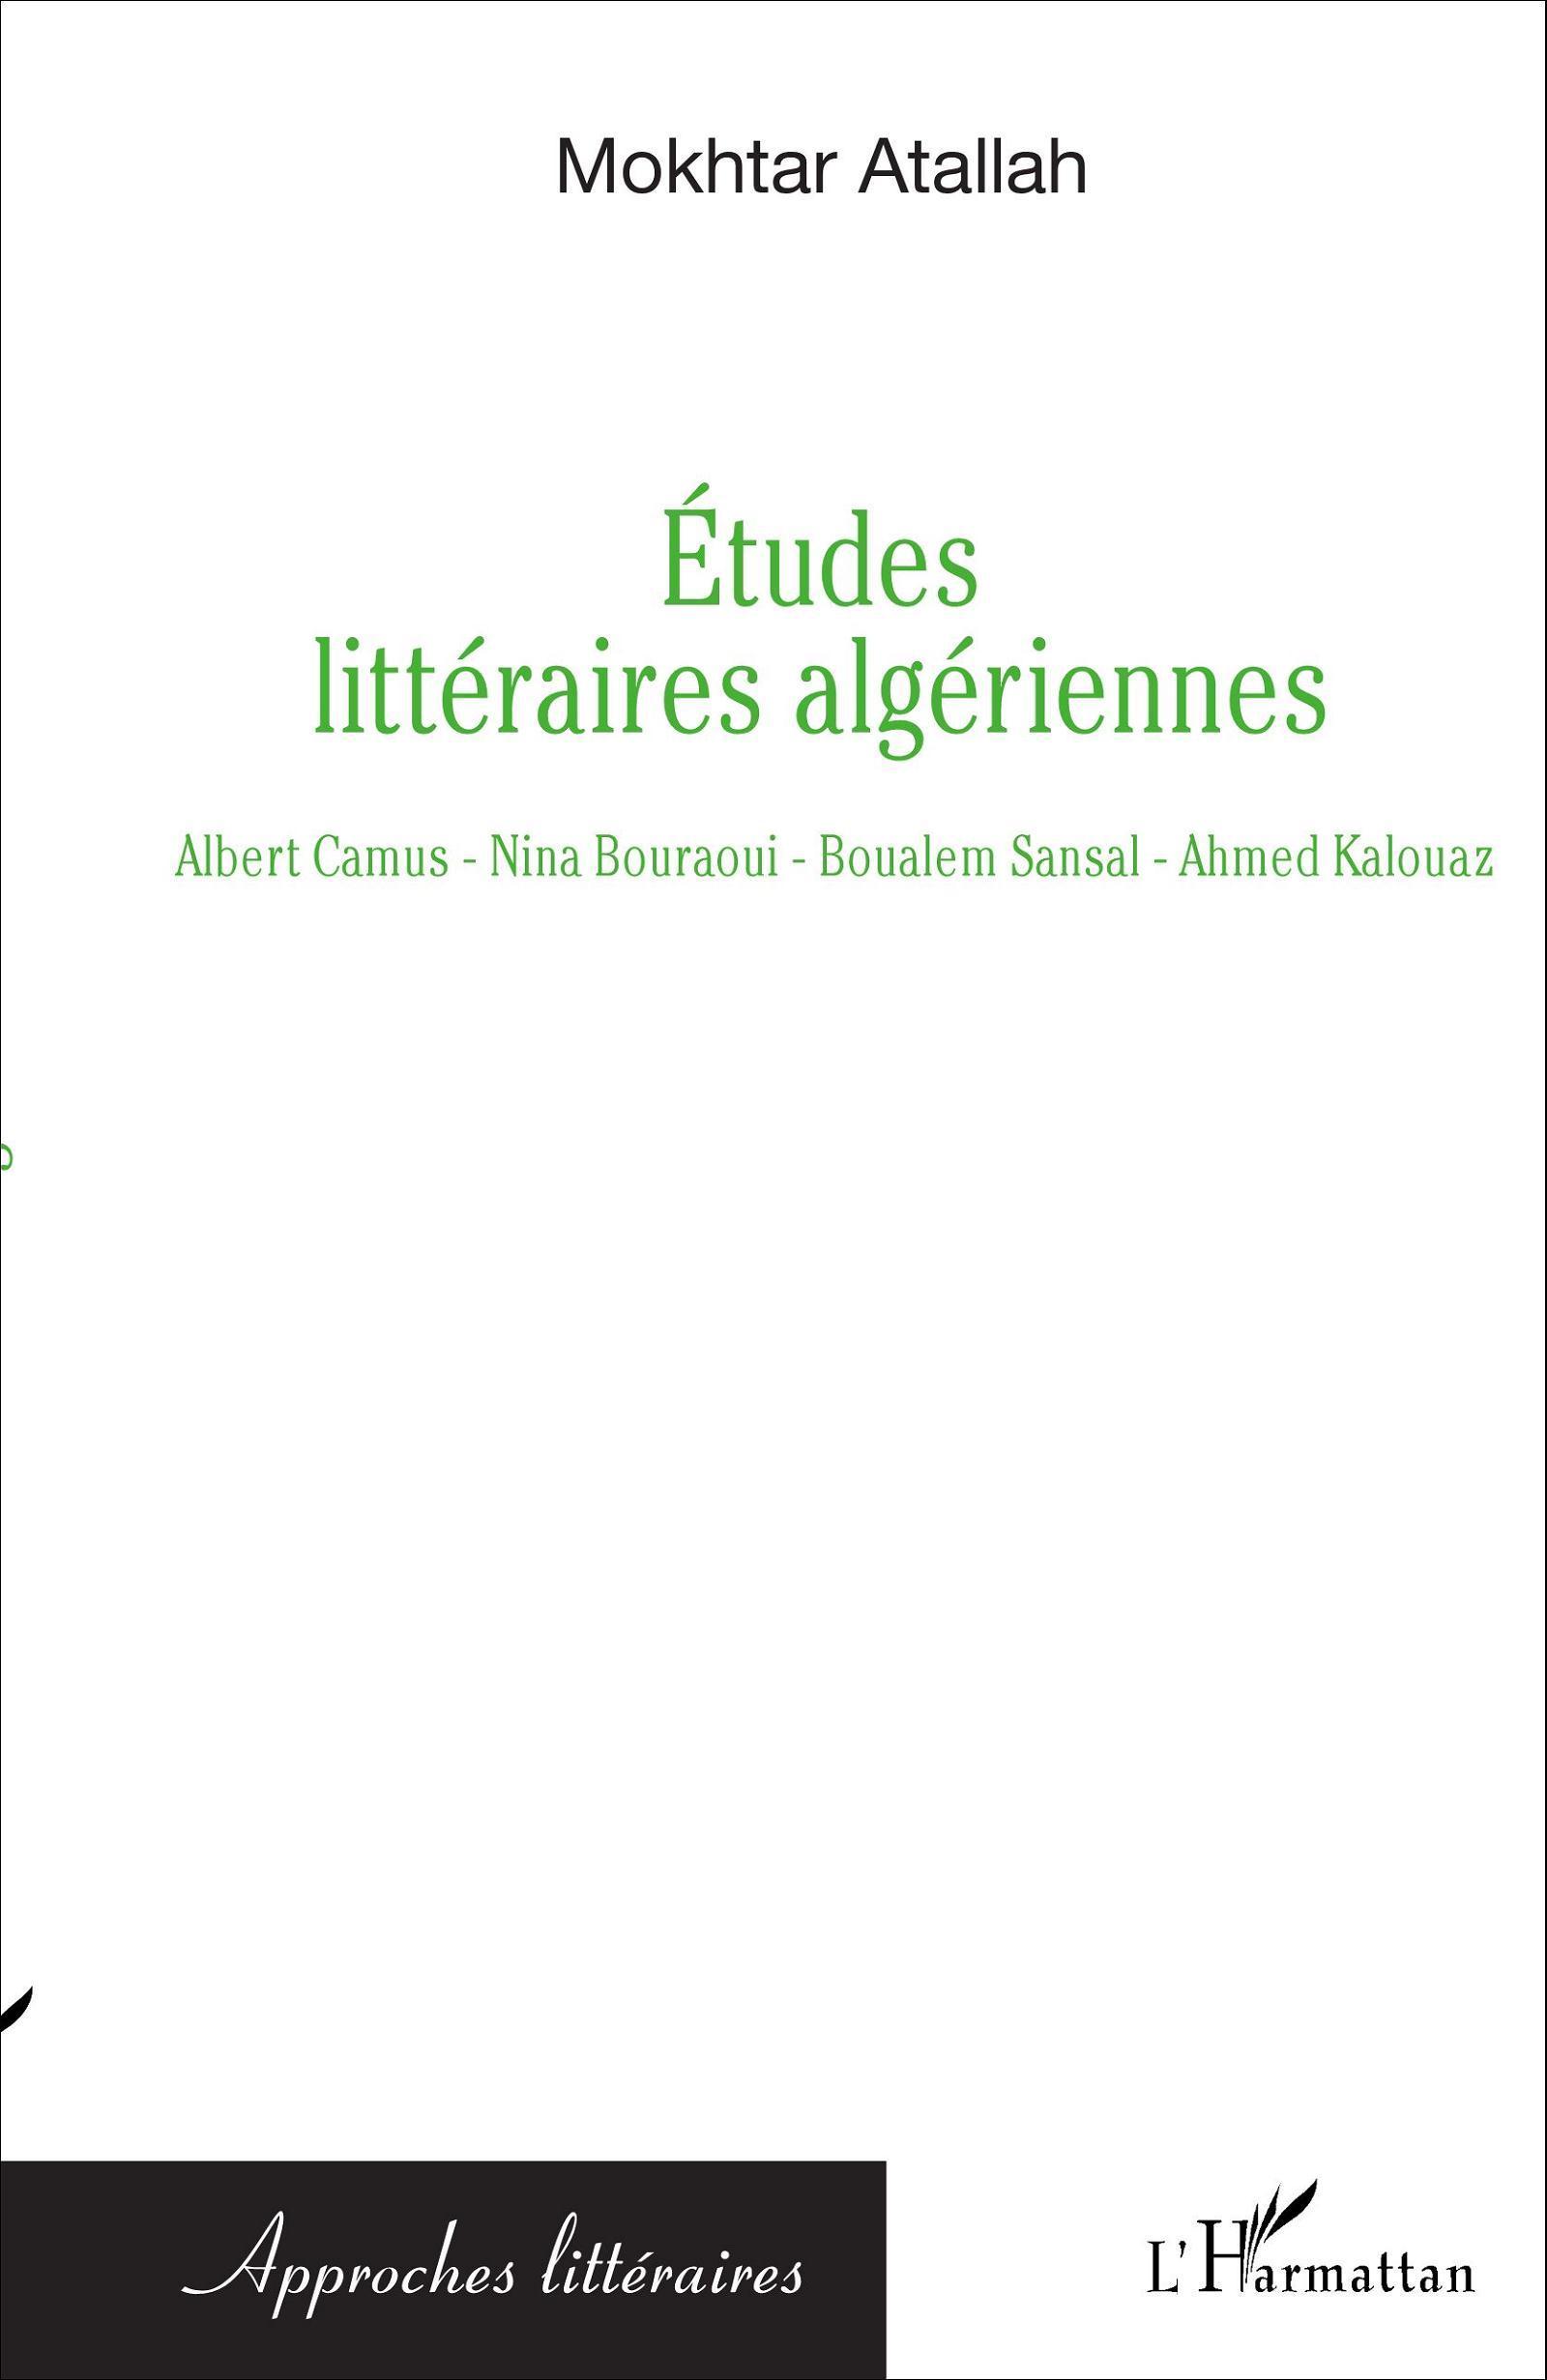 ETUDES LITTERAIRES ALGERIENNES ALBERT CAMUS NINA BOURAOUI BOUALEM SANSAL AHMED KALOUAZ